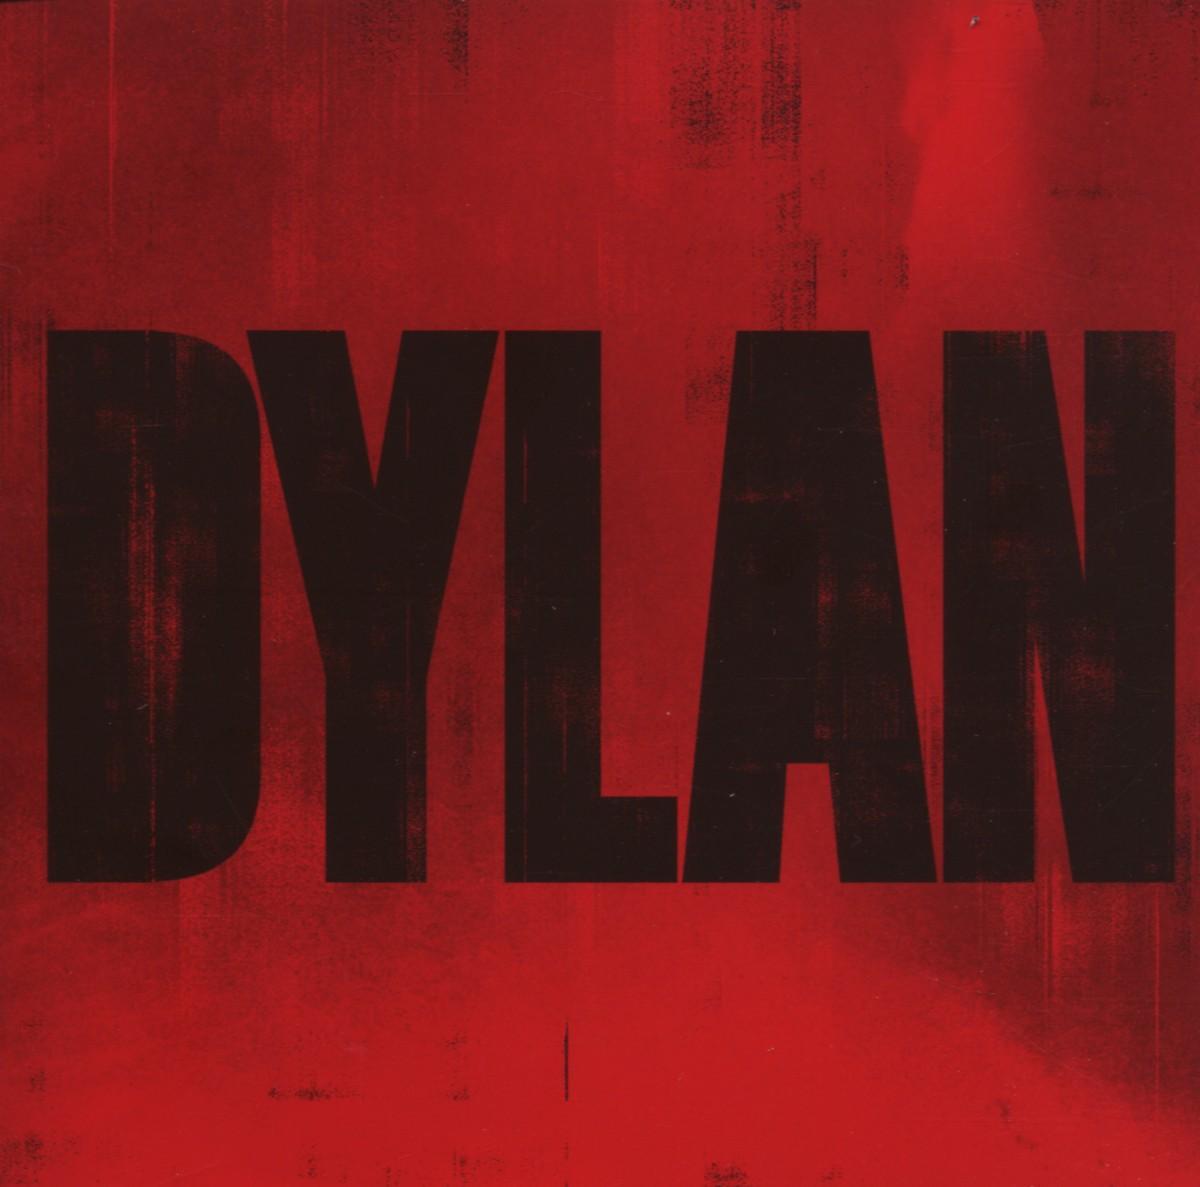 Bob Dylan - CD DYLAN